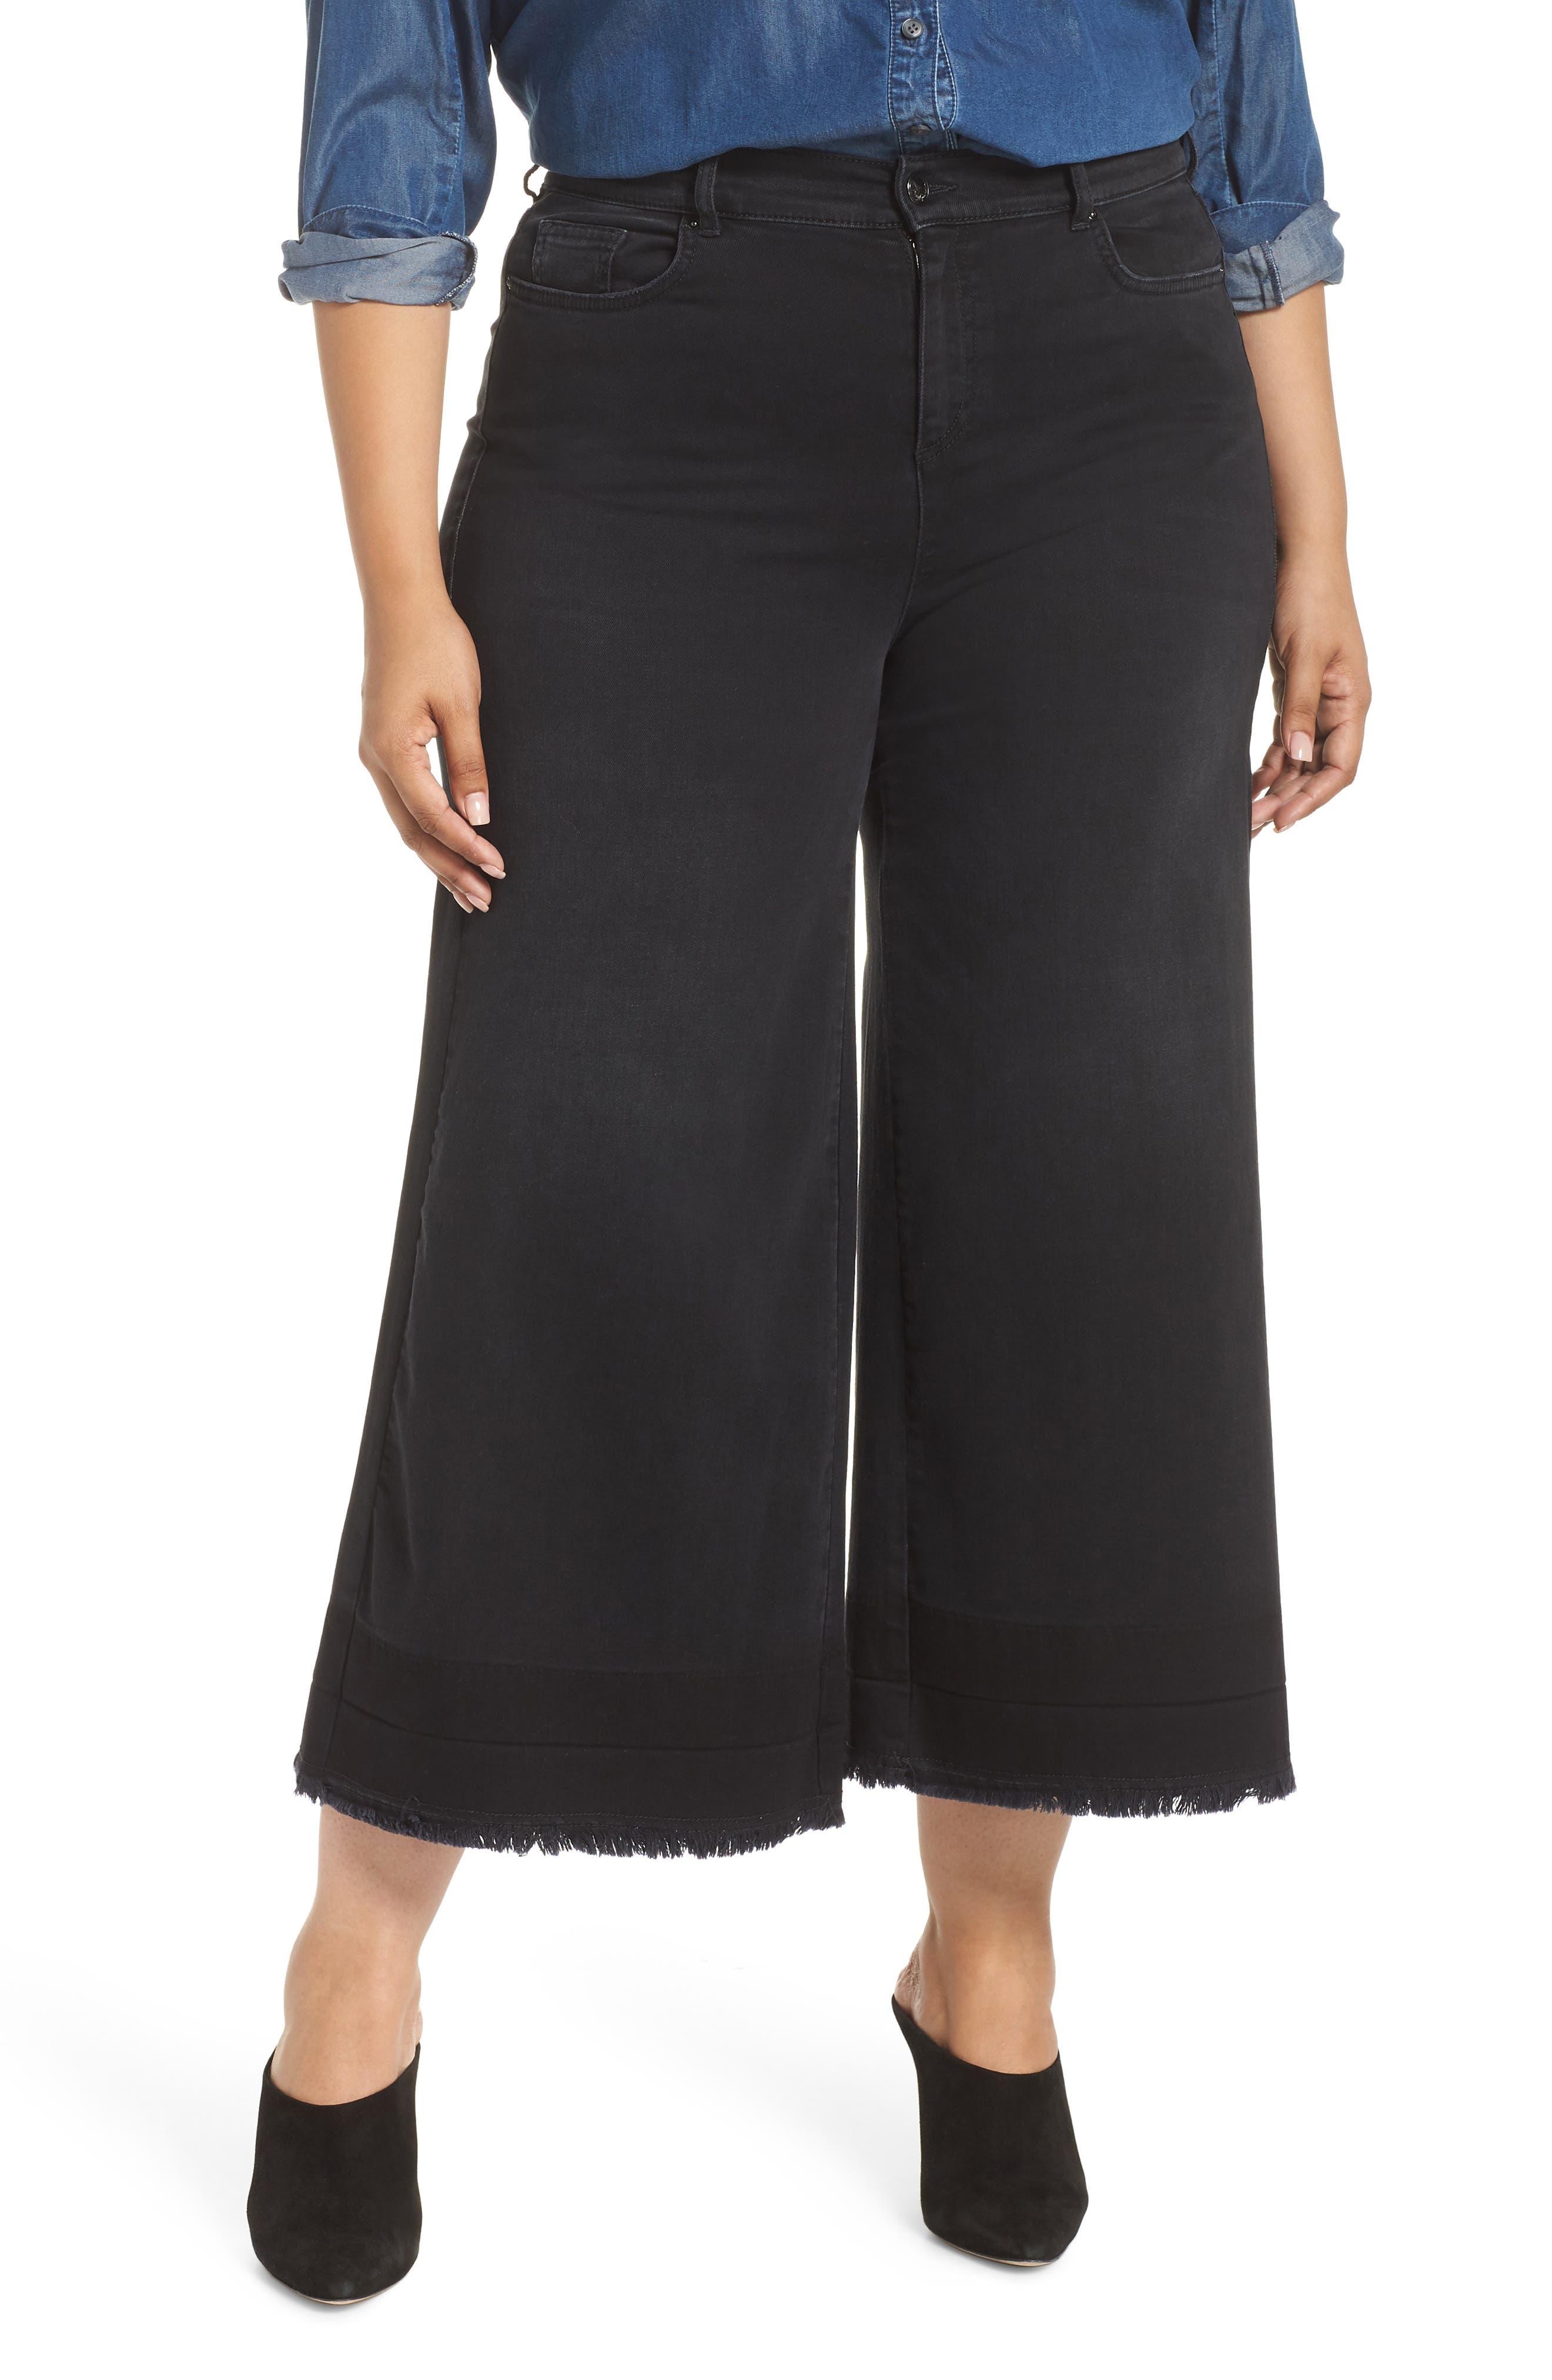 plus size women's ashley graham x marina rinaldi igloo high rise crop flare jeans